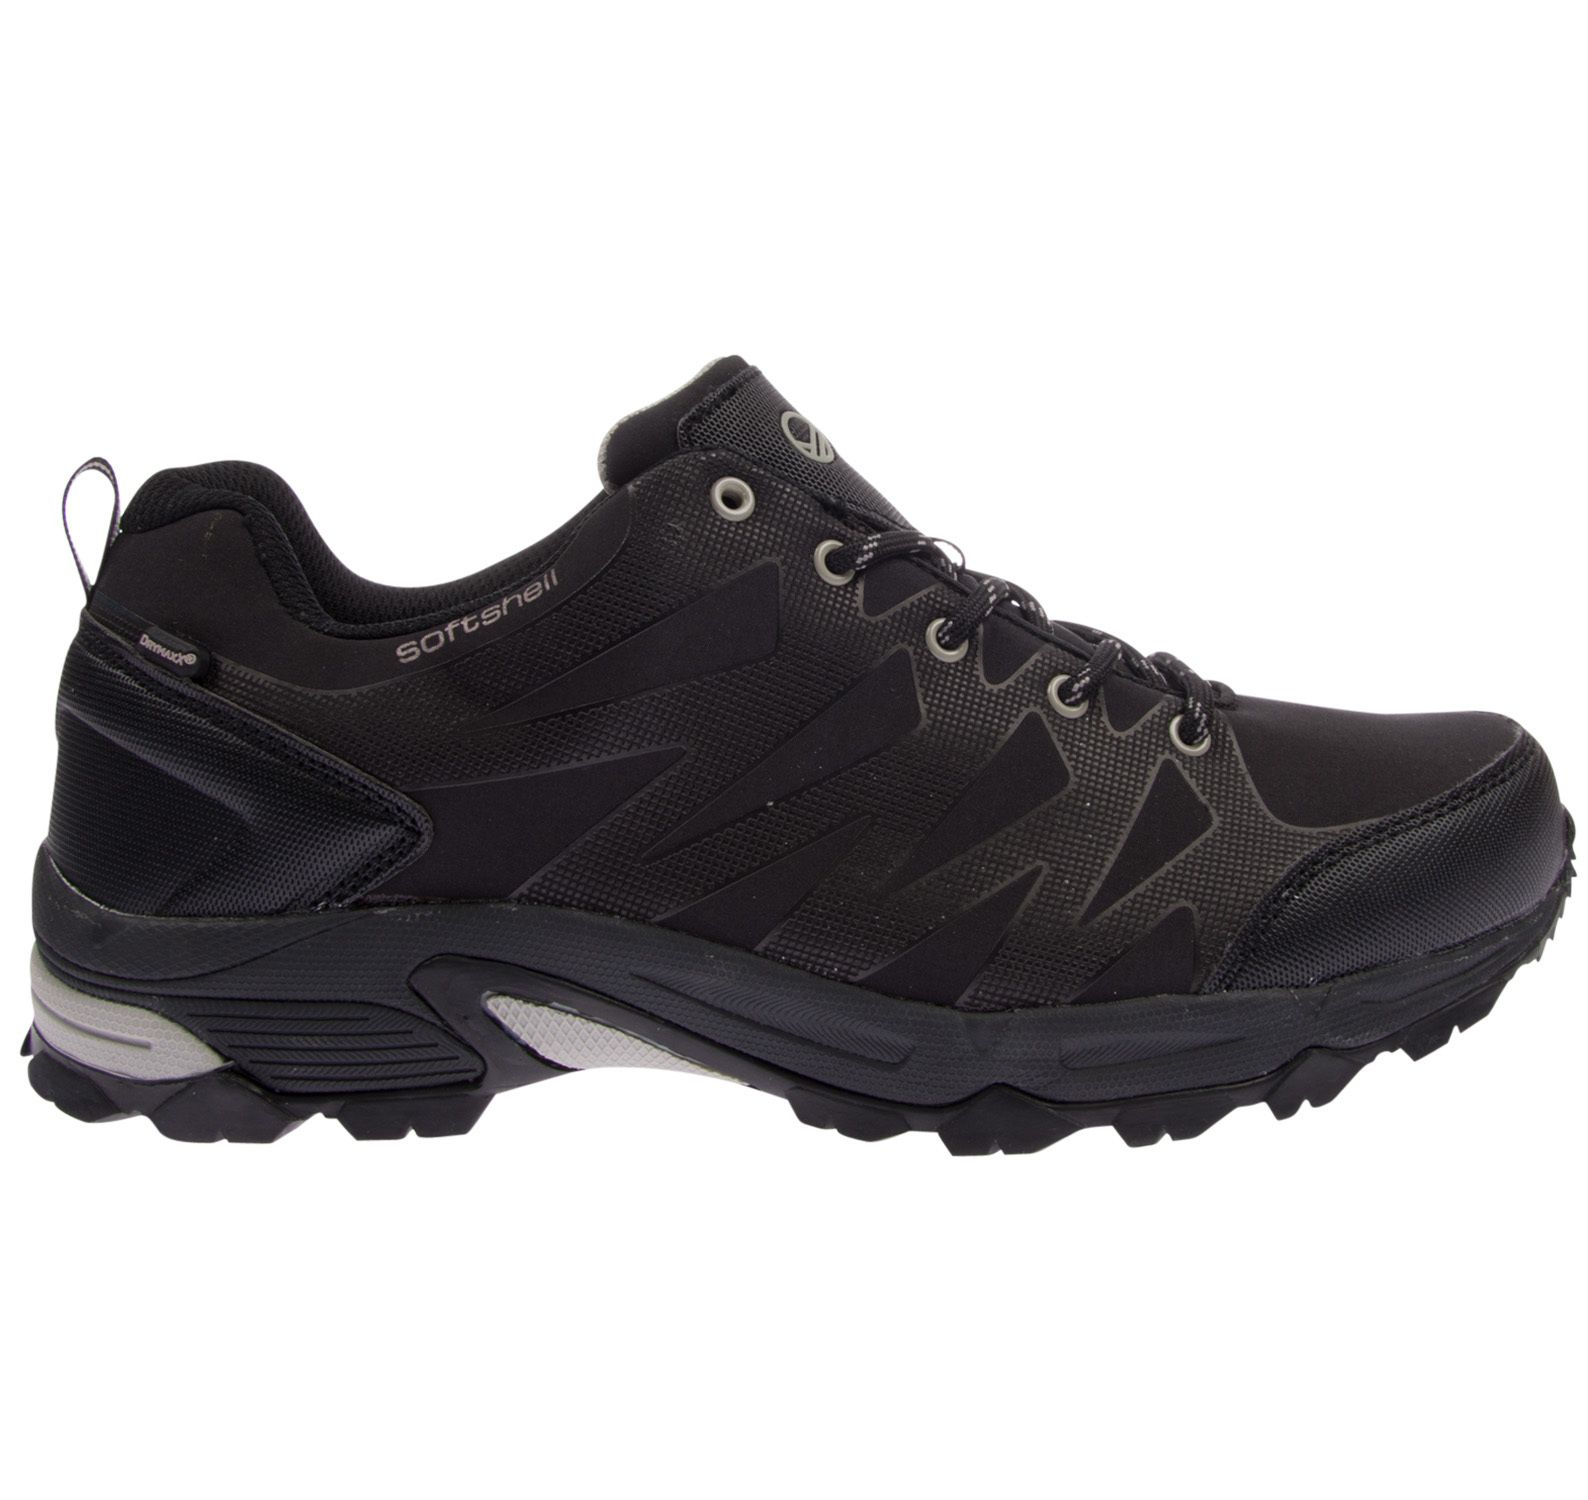 Tano Dx M Trekking Shoe, Black, 47,  Halti